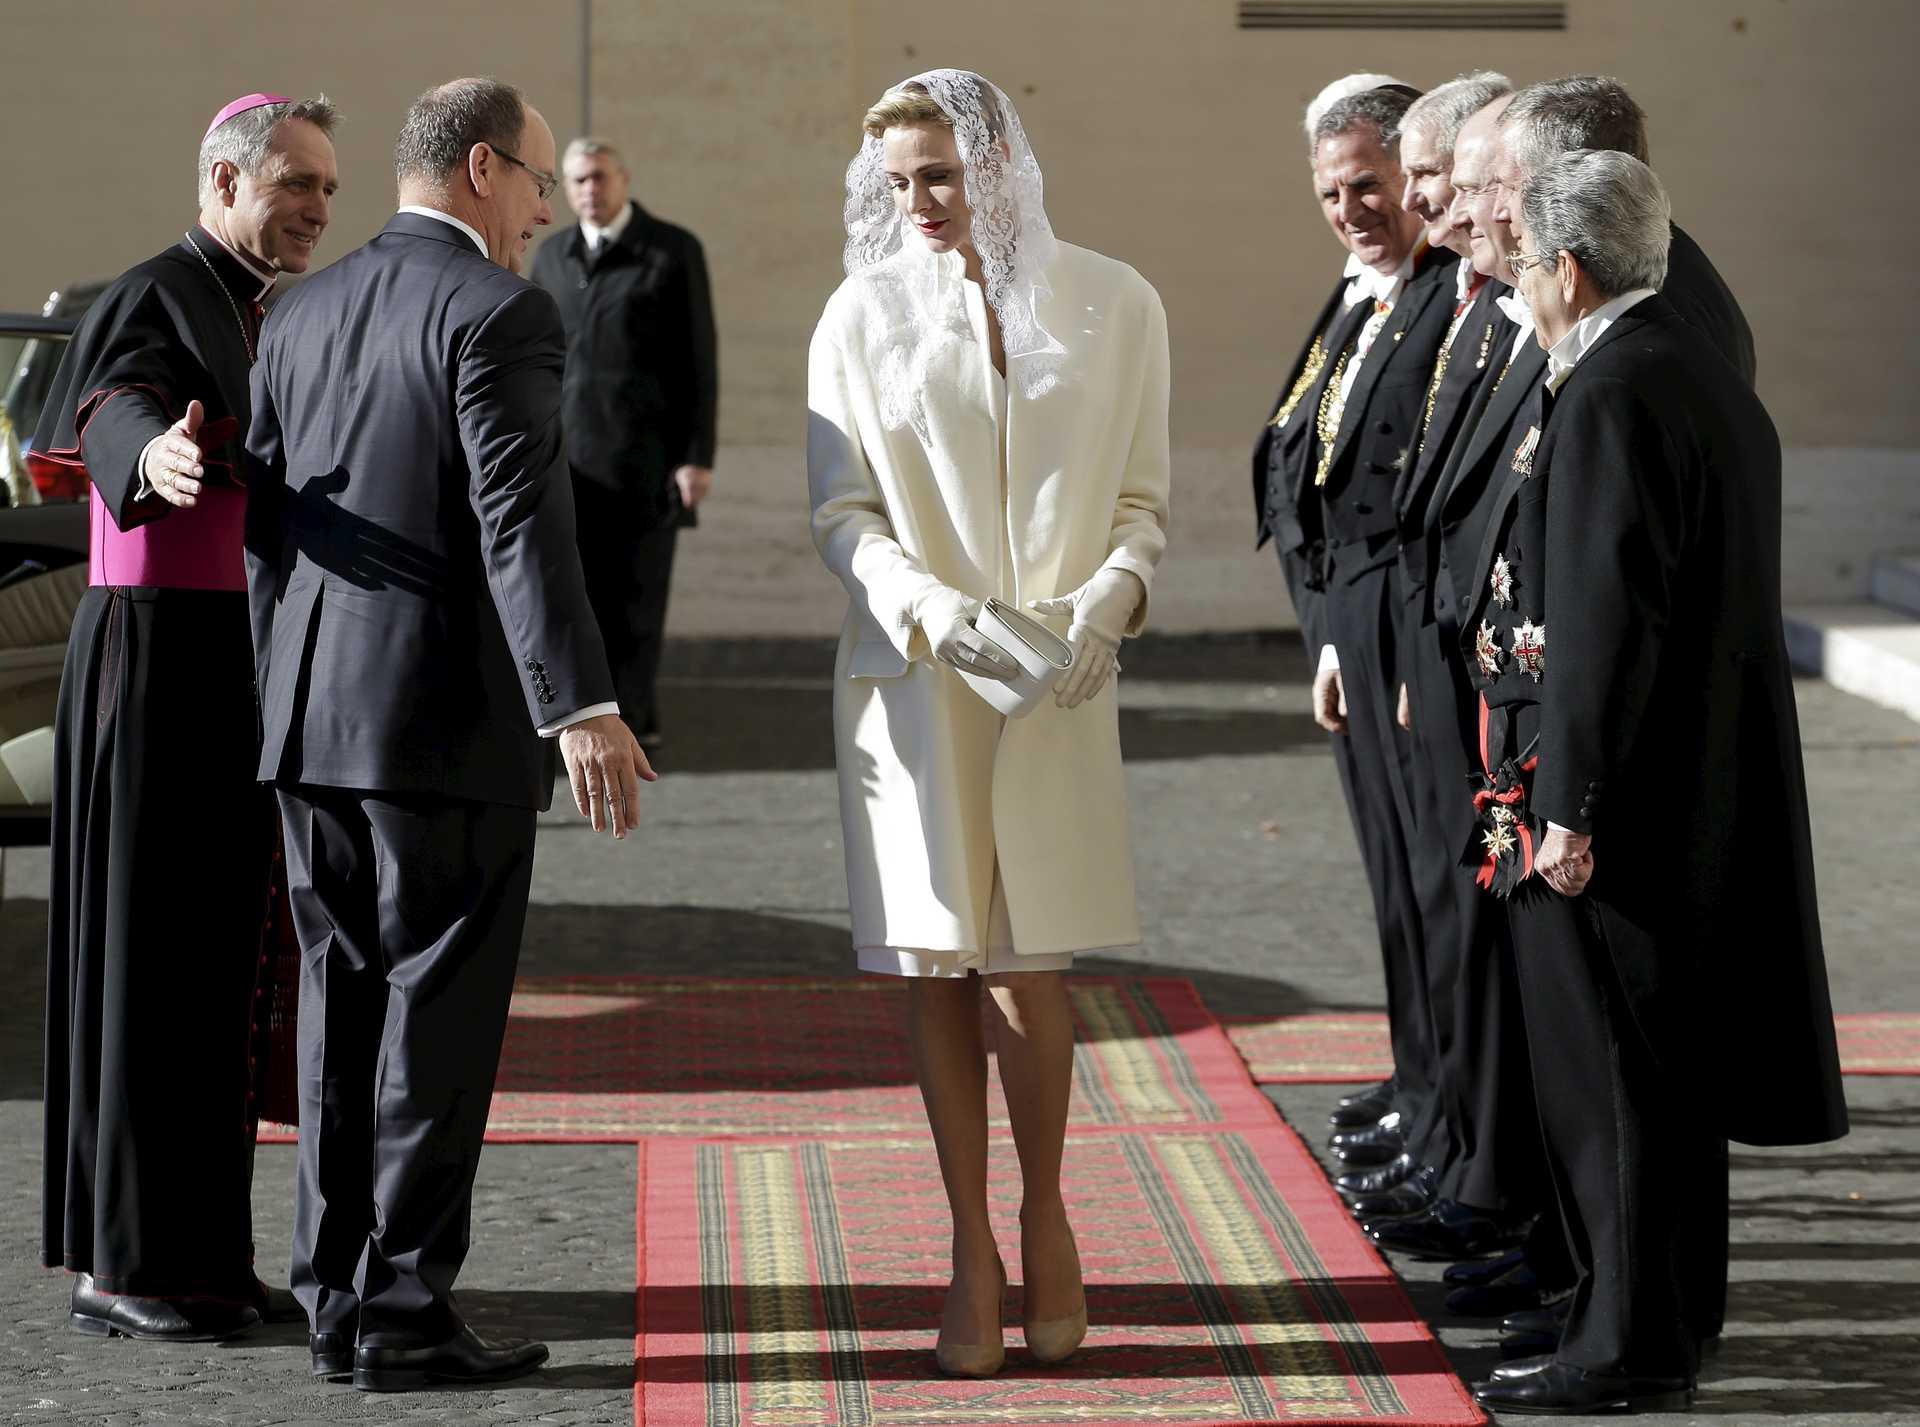 Princesa Charlene de Mônaco usando o véu na visita ao Papa